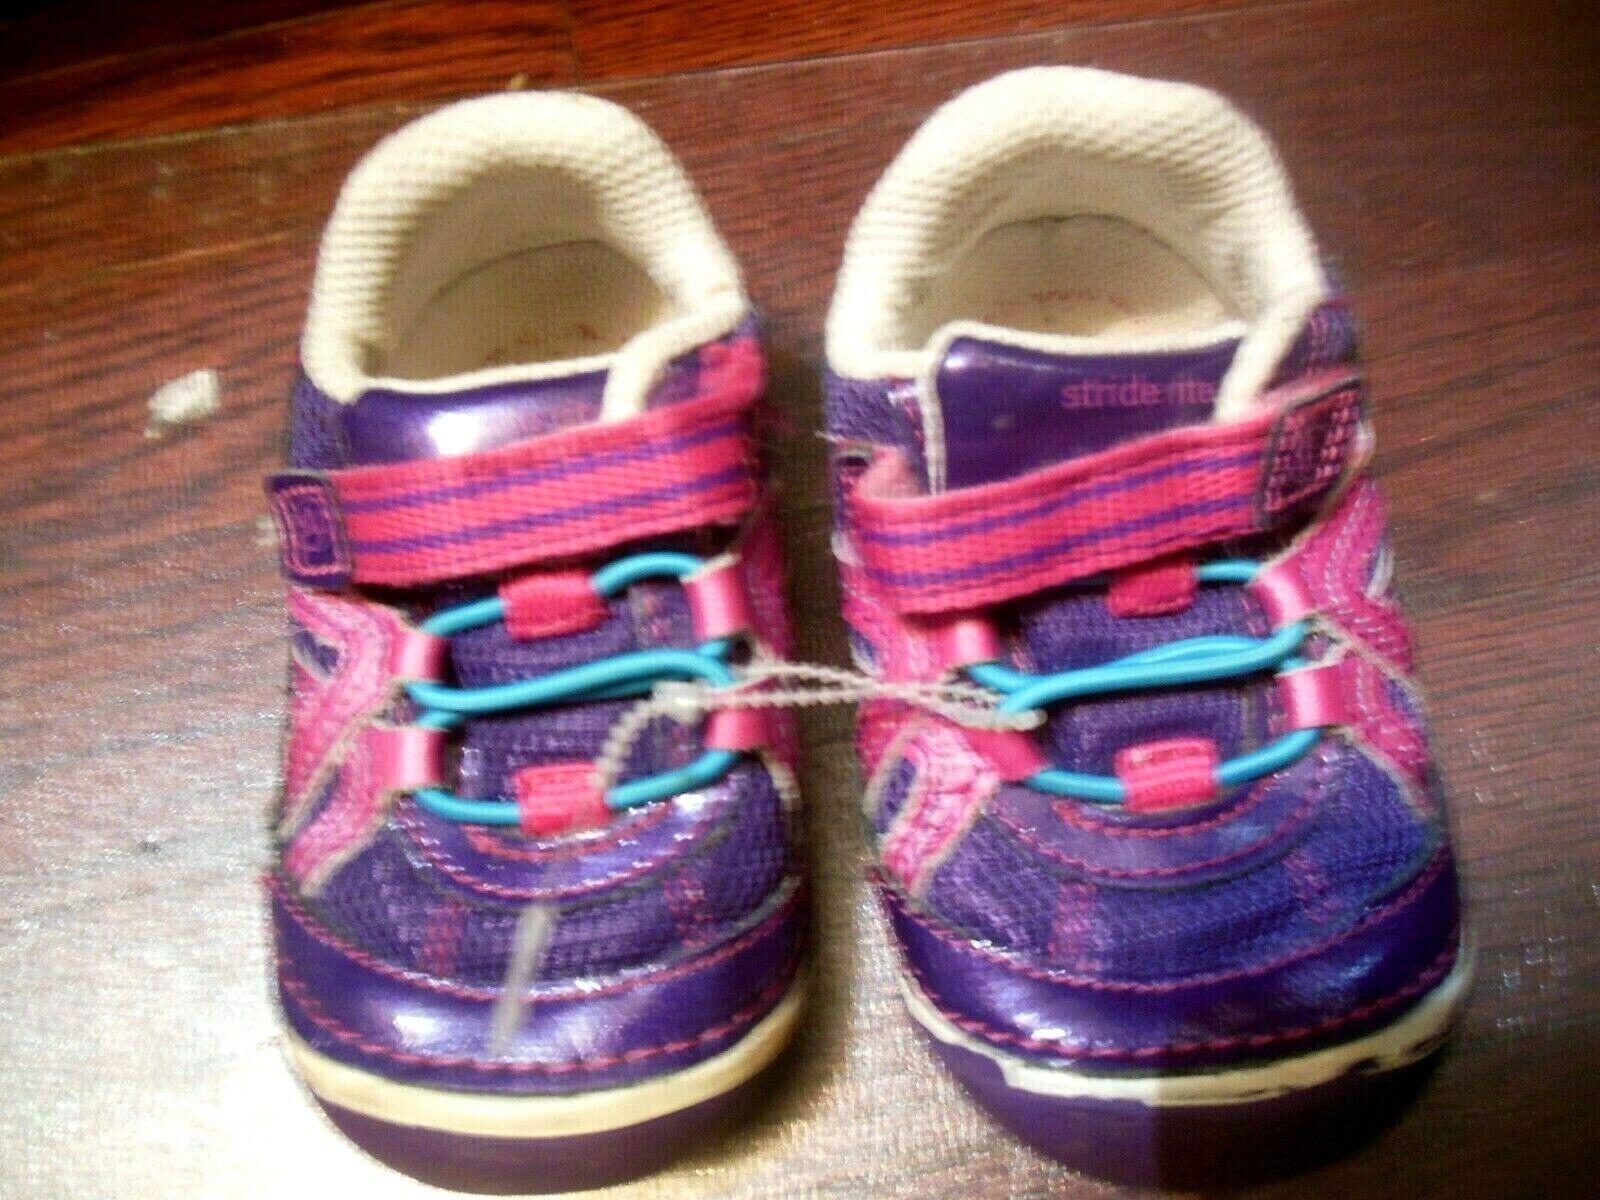 Start Rite FRANGIPANI PURPLE Girls Sparkle Casual Shoes Boots 11-12.5 F Fit BNIB